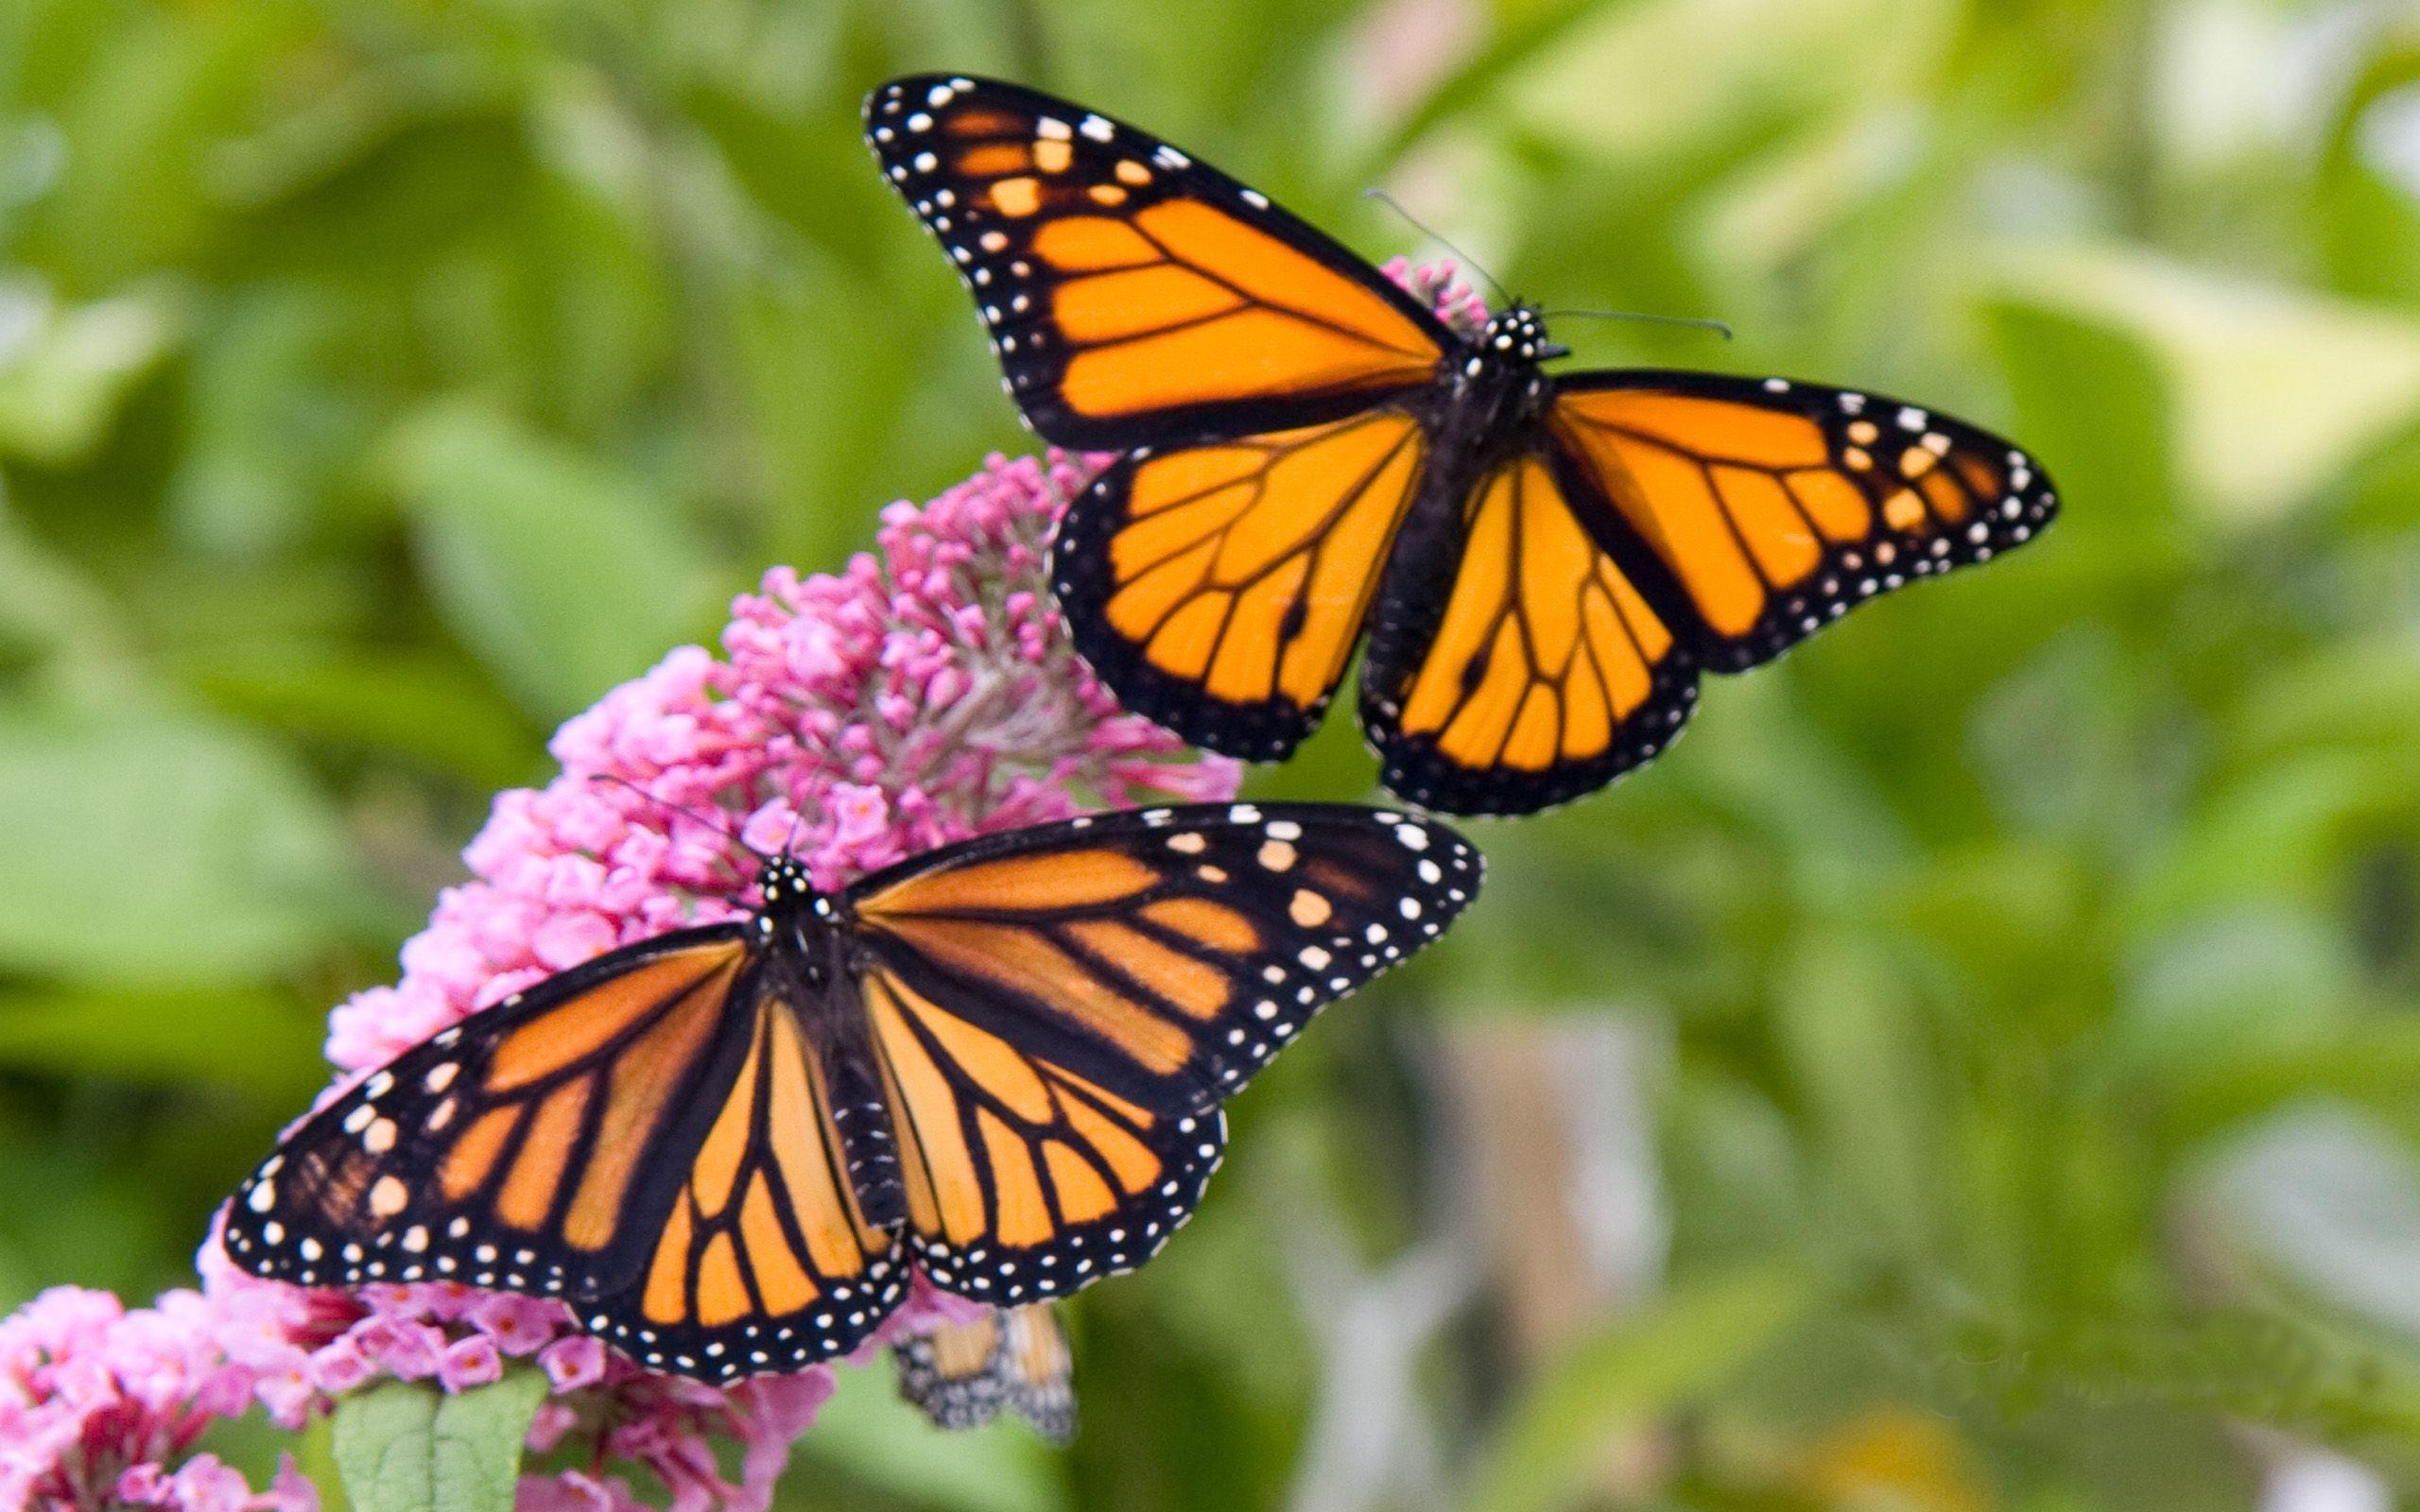 Monarch Butterfly Wallpapers - Top Free Monarch Butterfly ...